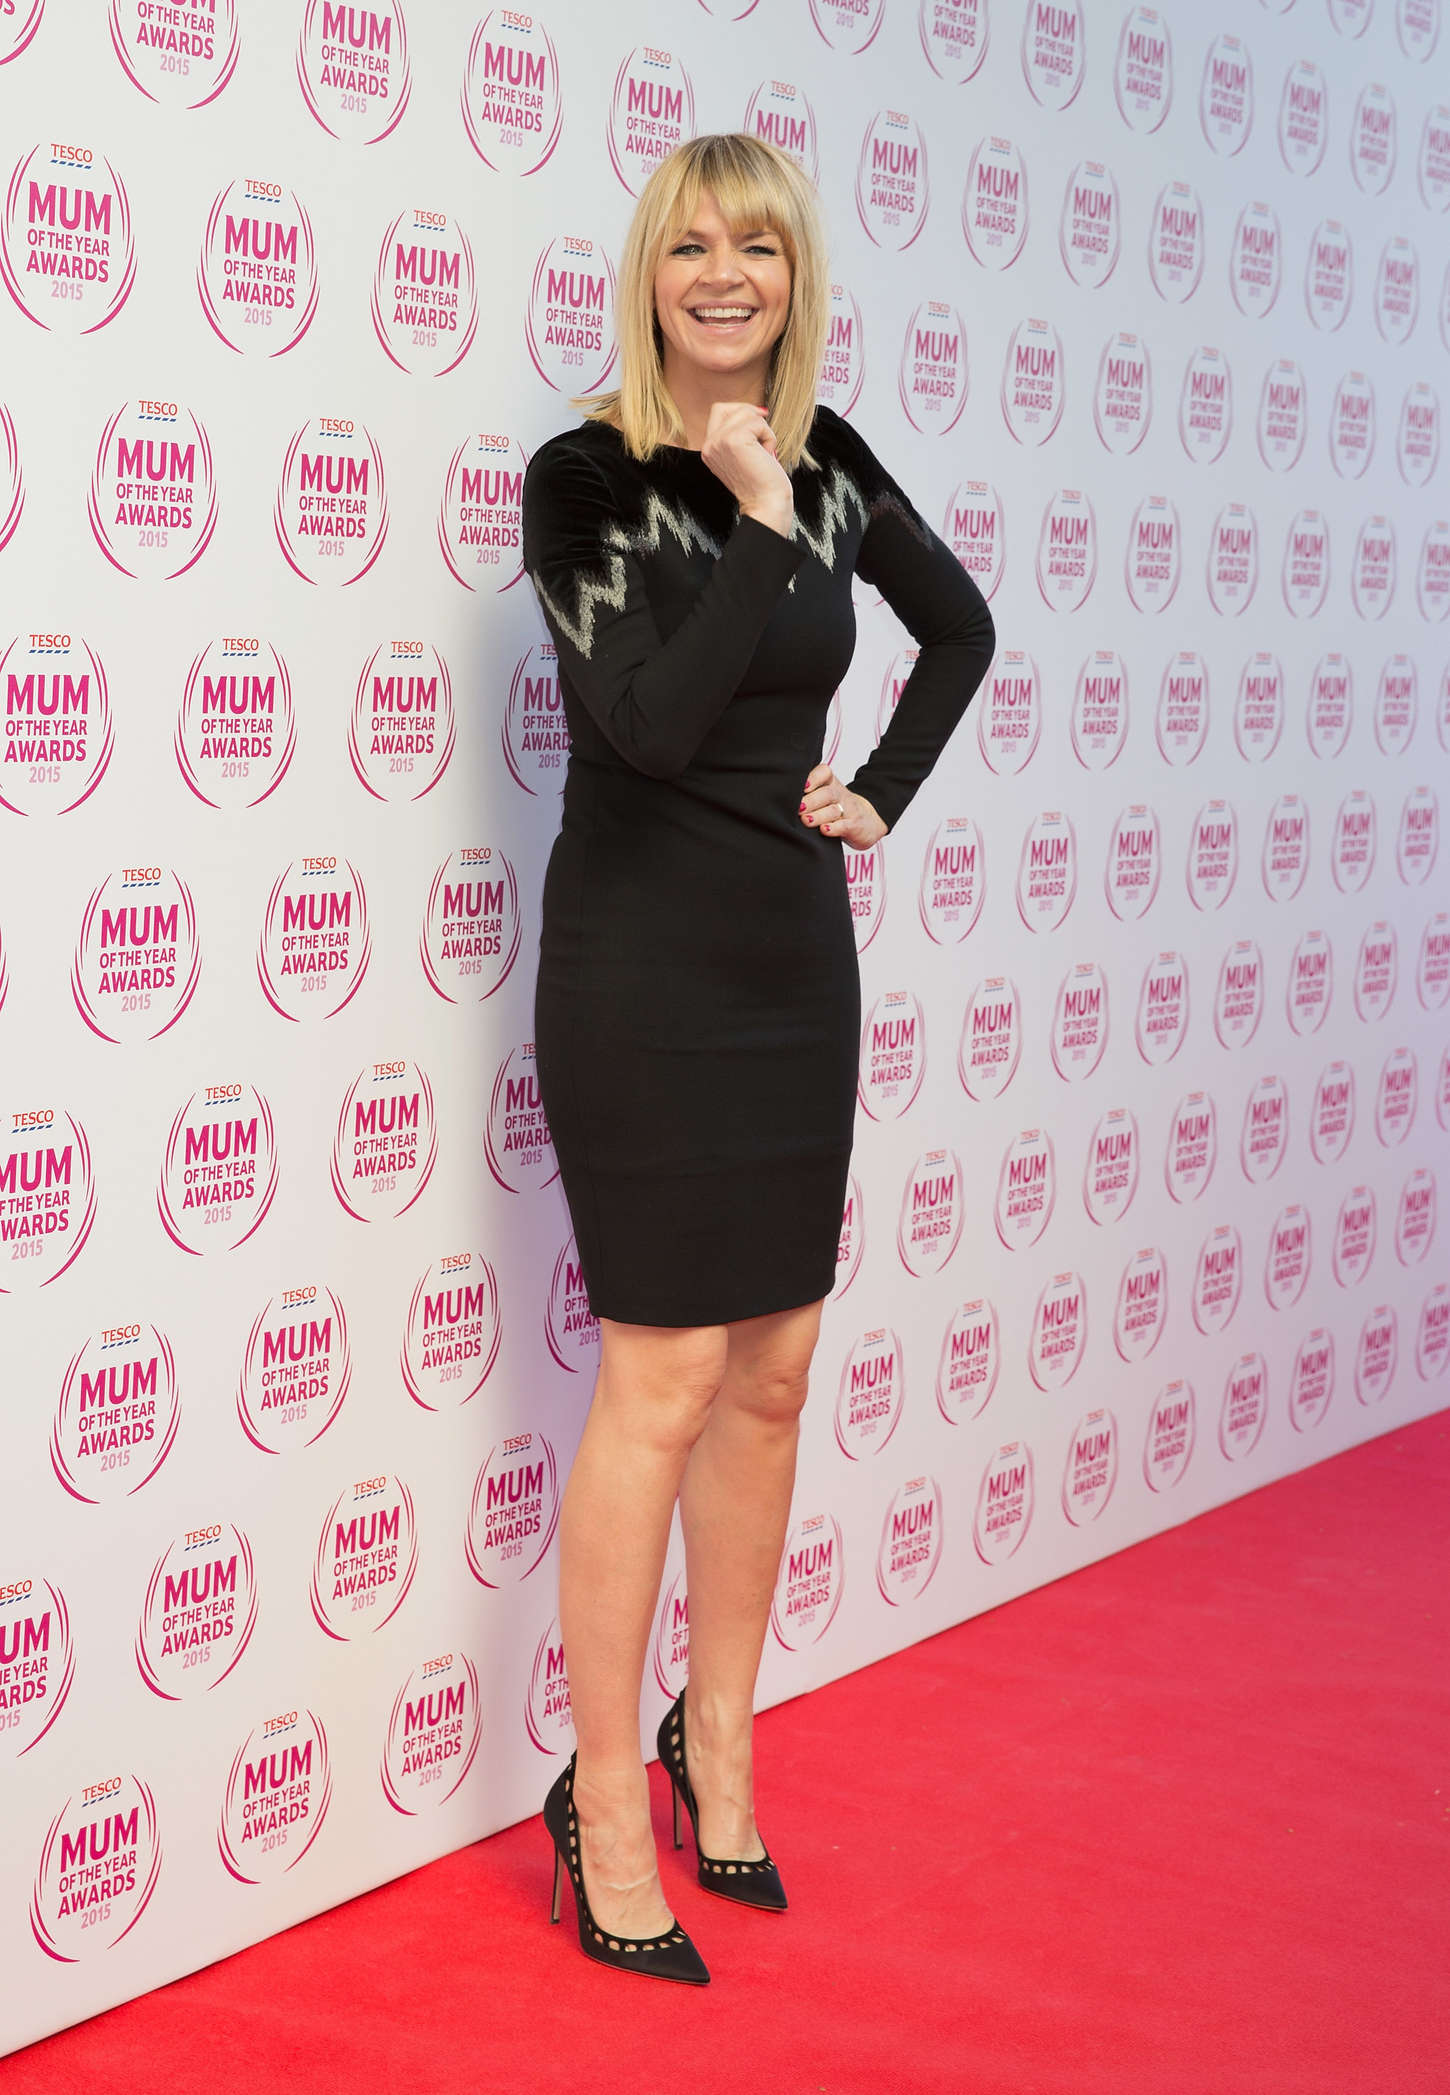 Zoe Ball: Tesco Mum Of The Year Awards 2015 -08 - GotCeleb